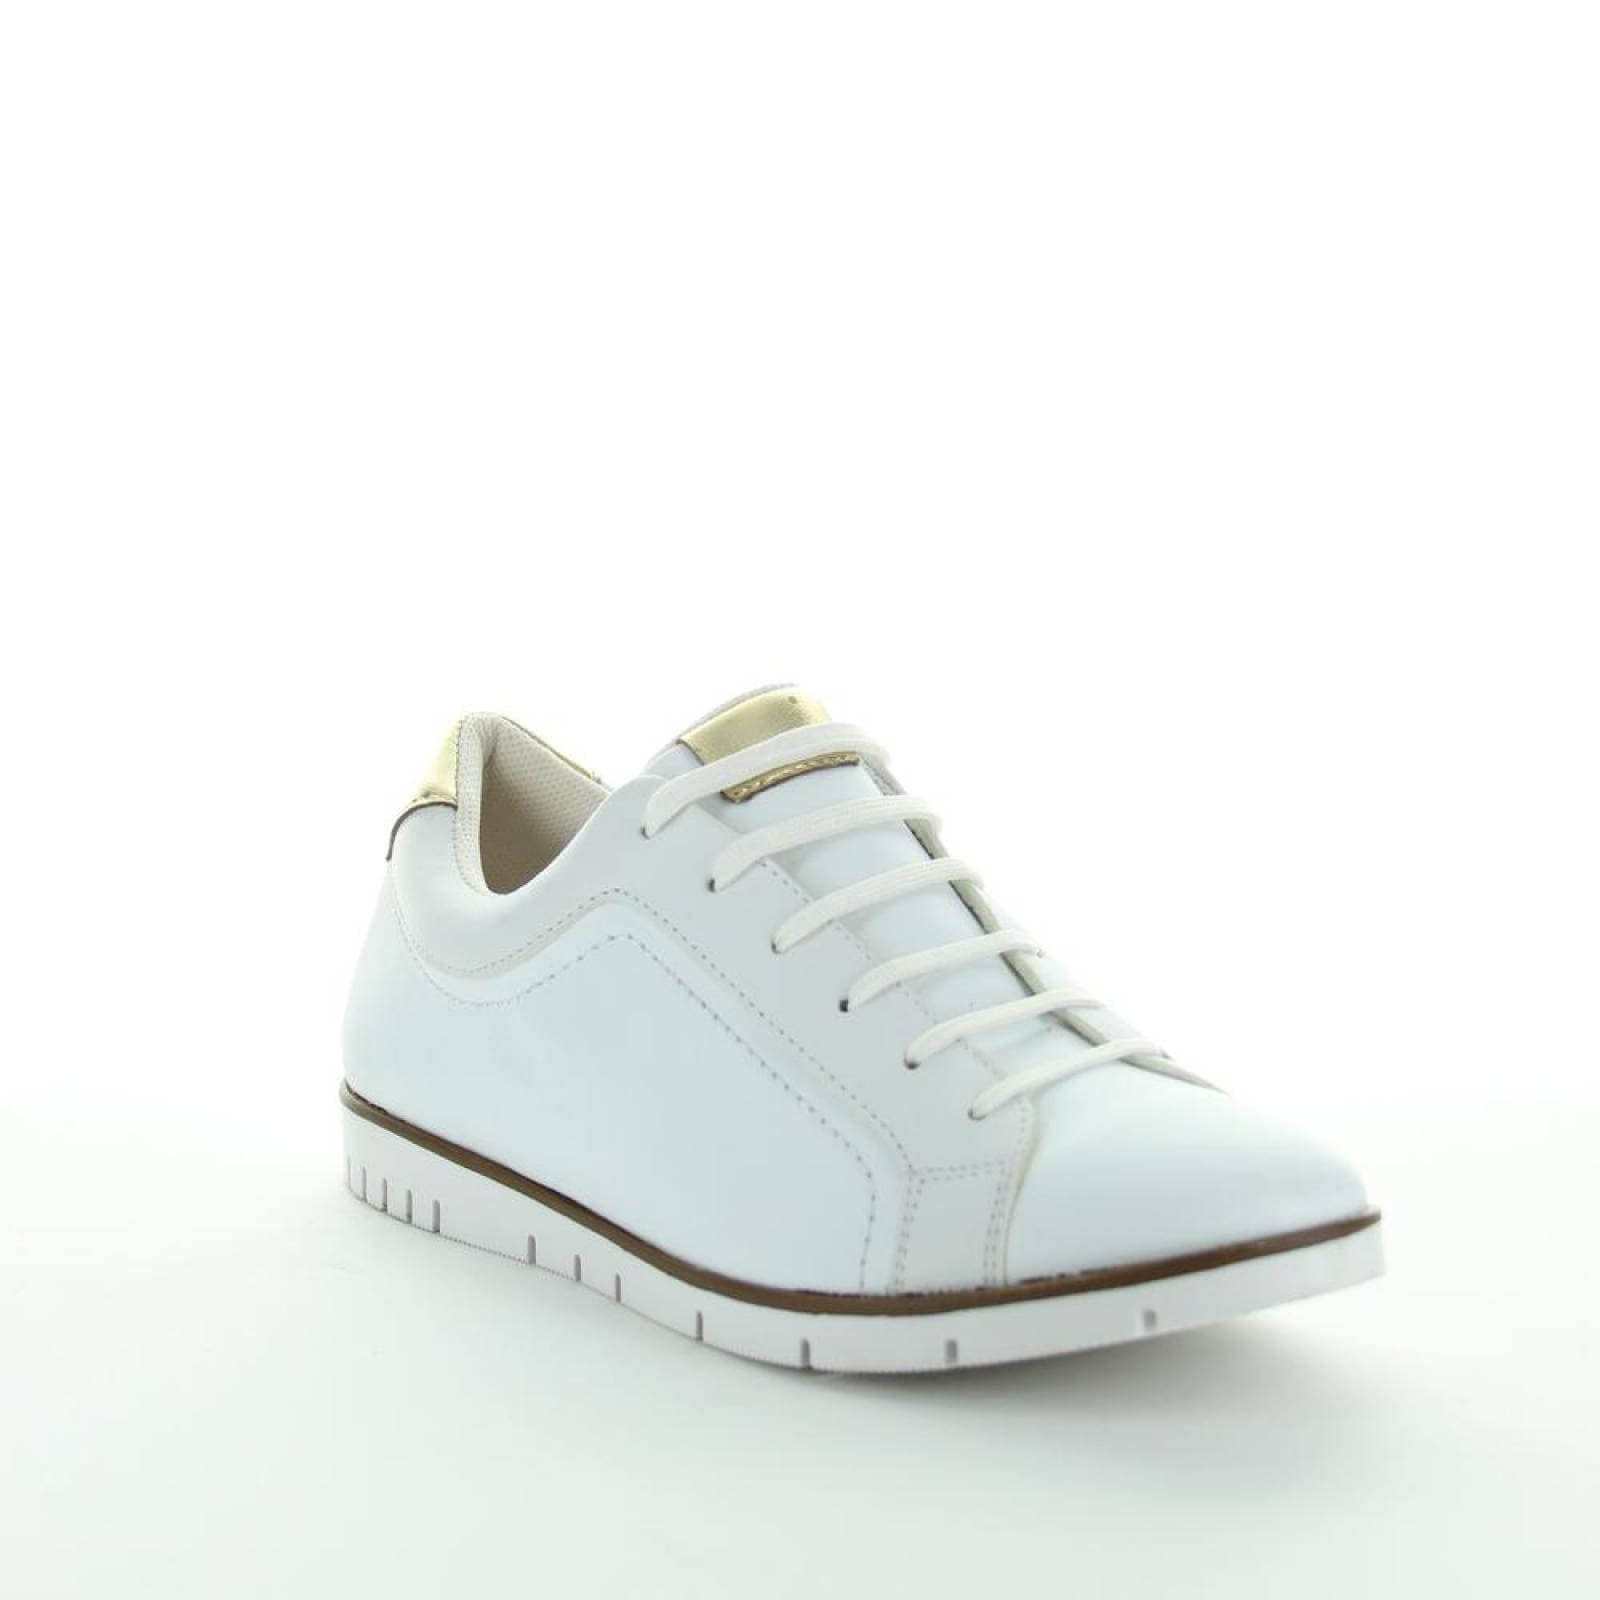 Tenis Padus Mujer Blanco Textil Raf014